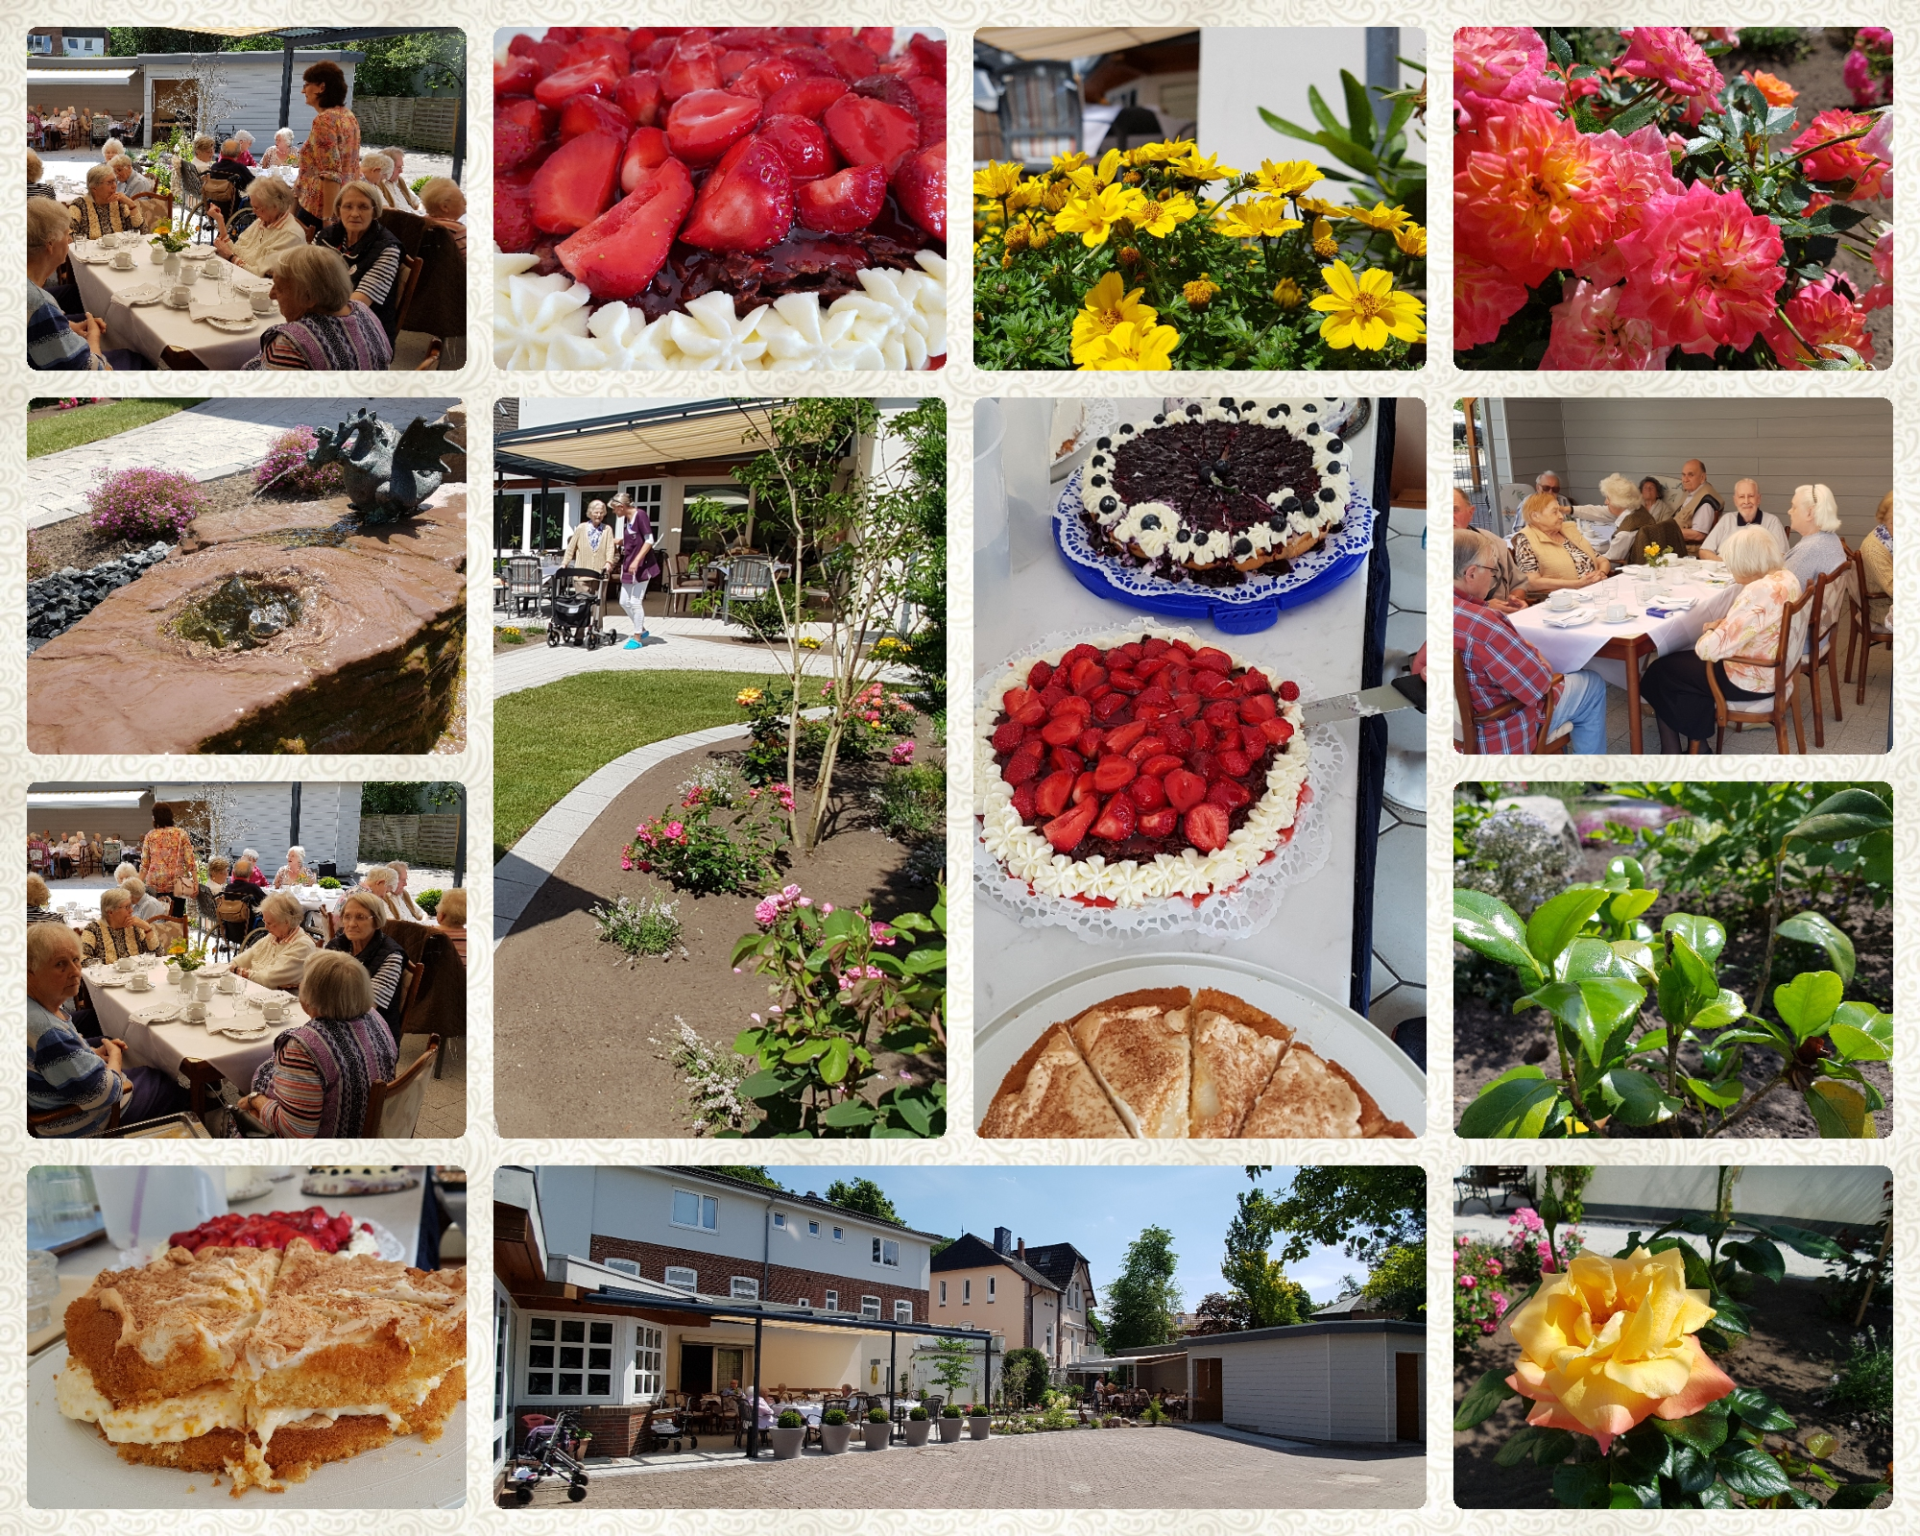 Der neue Garten - Haus Parkblick Bad Segeberg